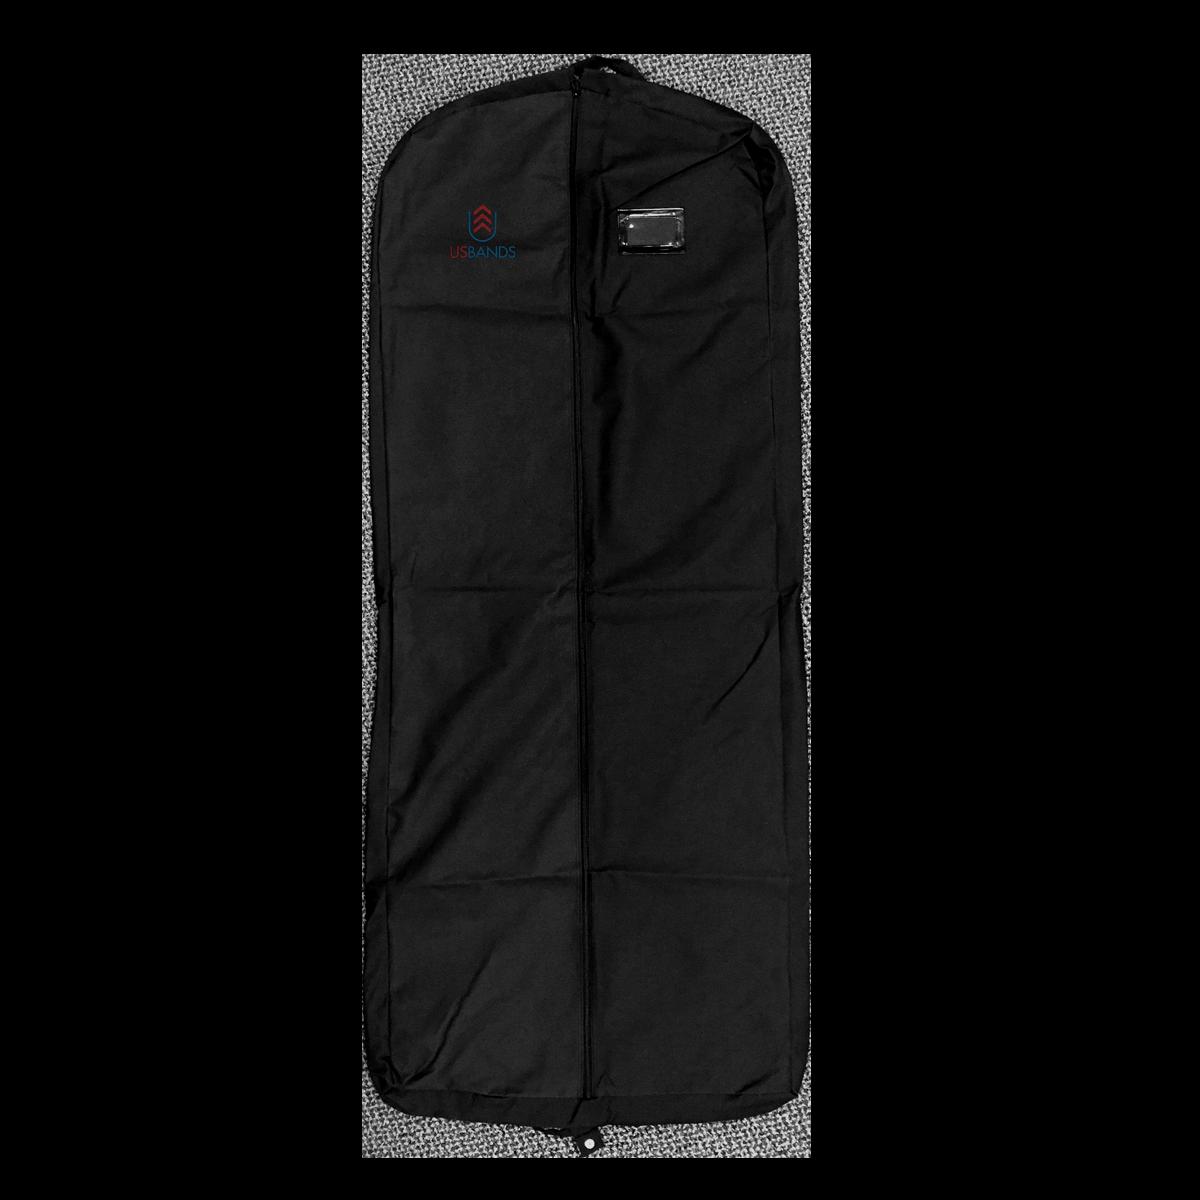 USBands Logo Garment Bag